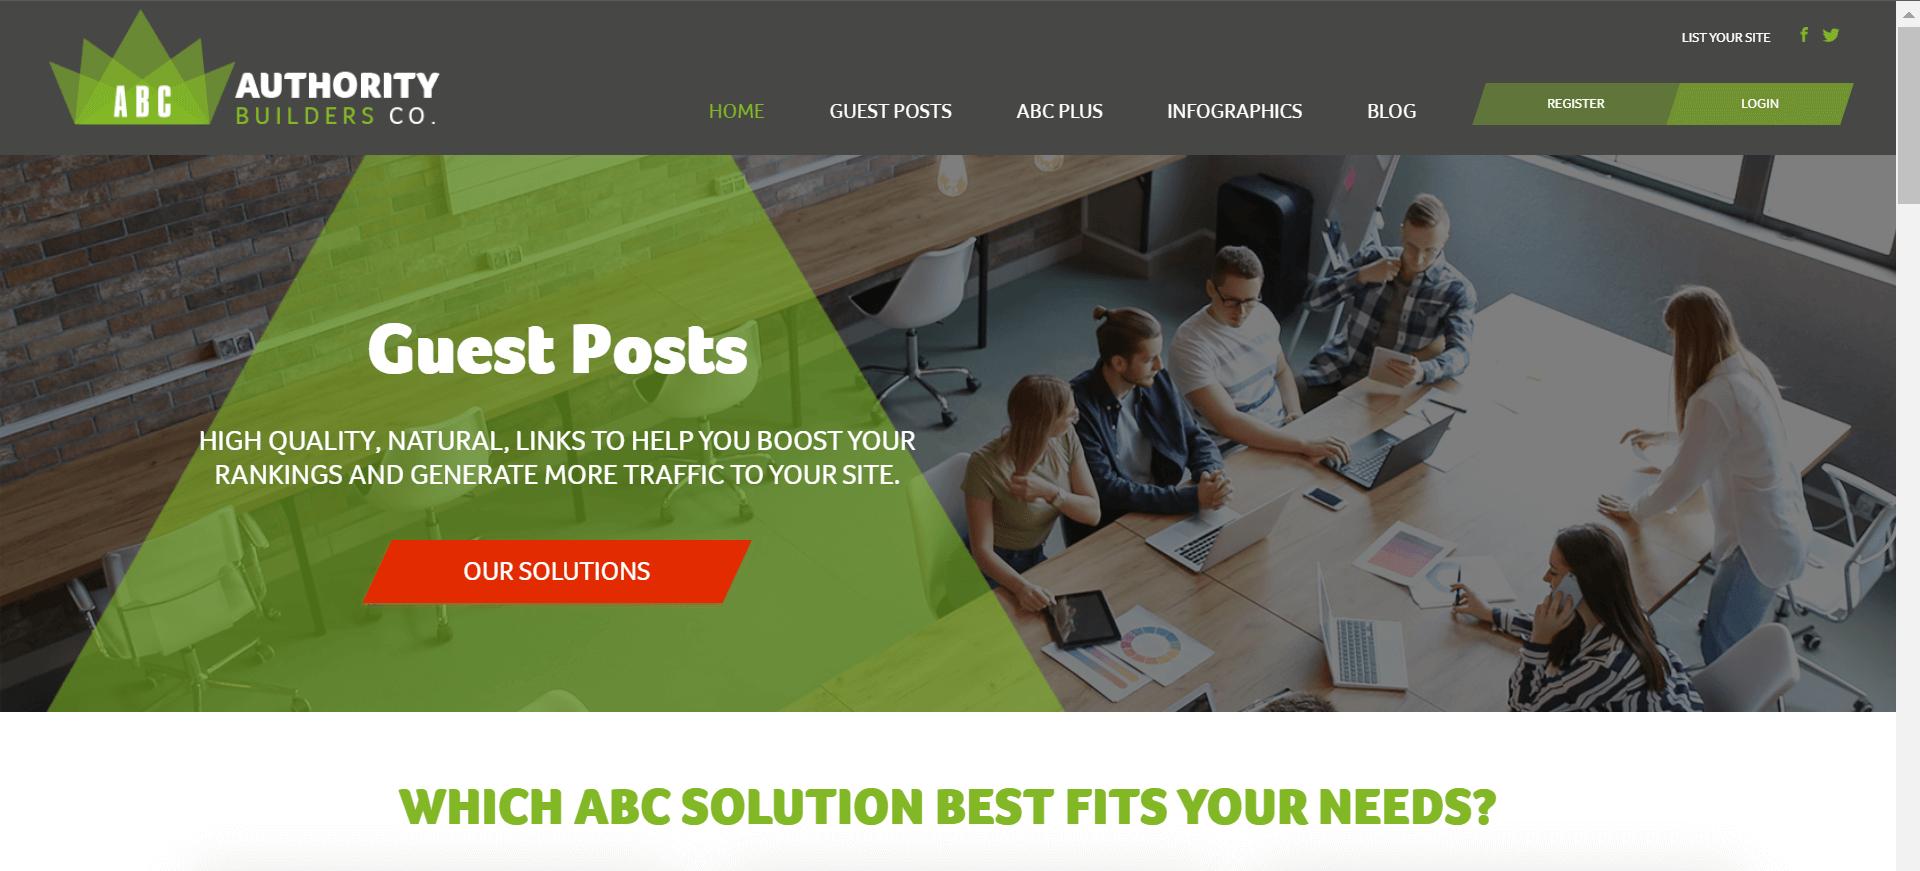 image of website Authority Builders Co.